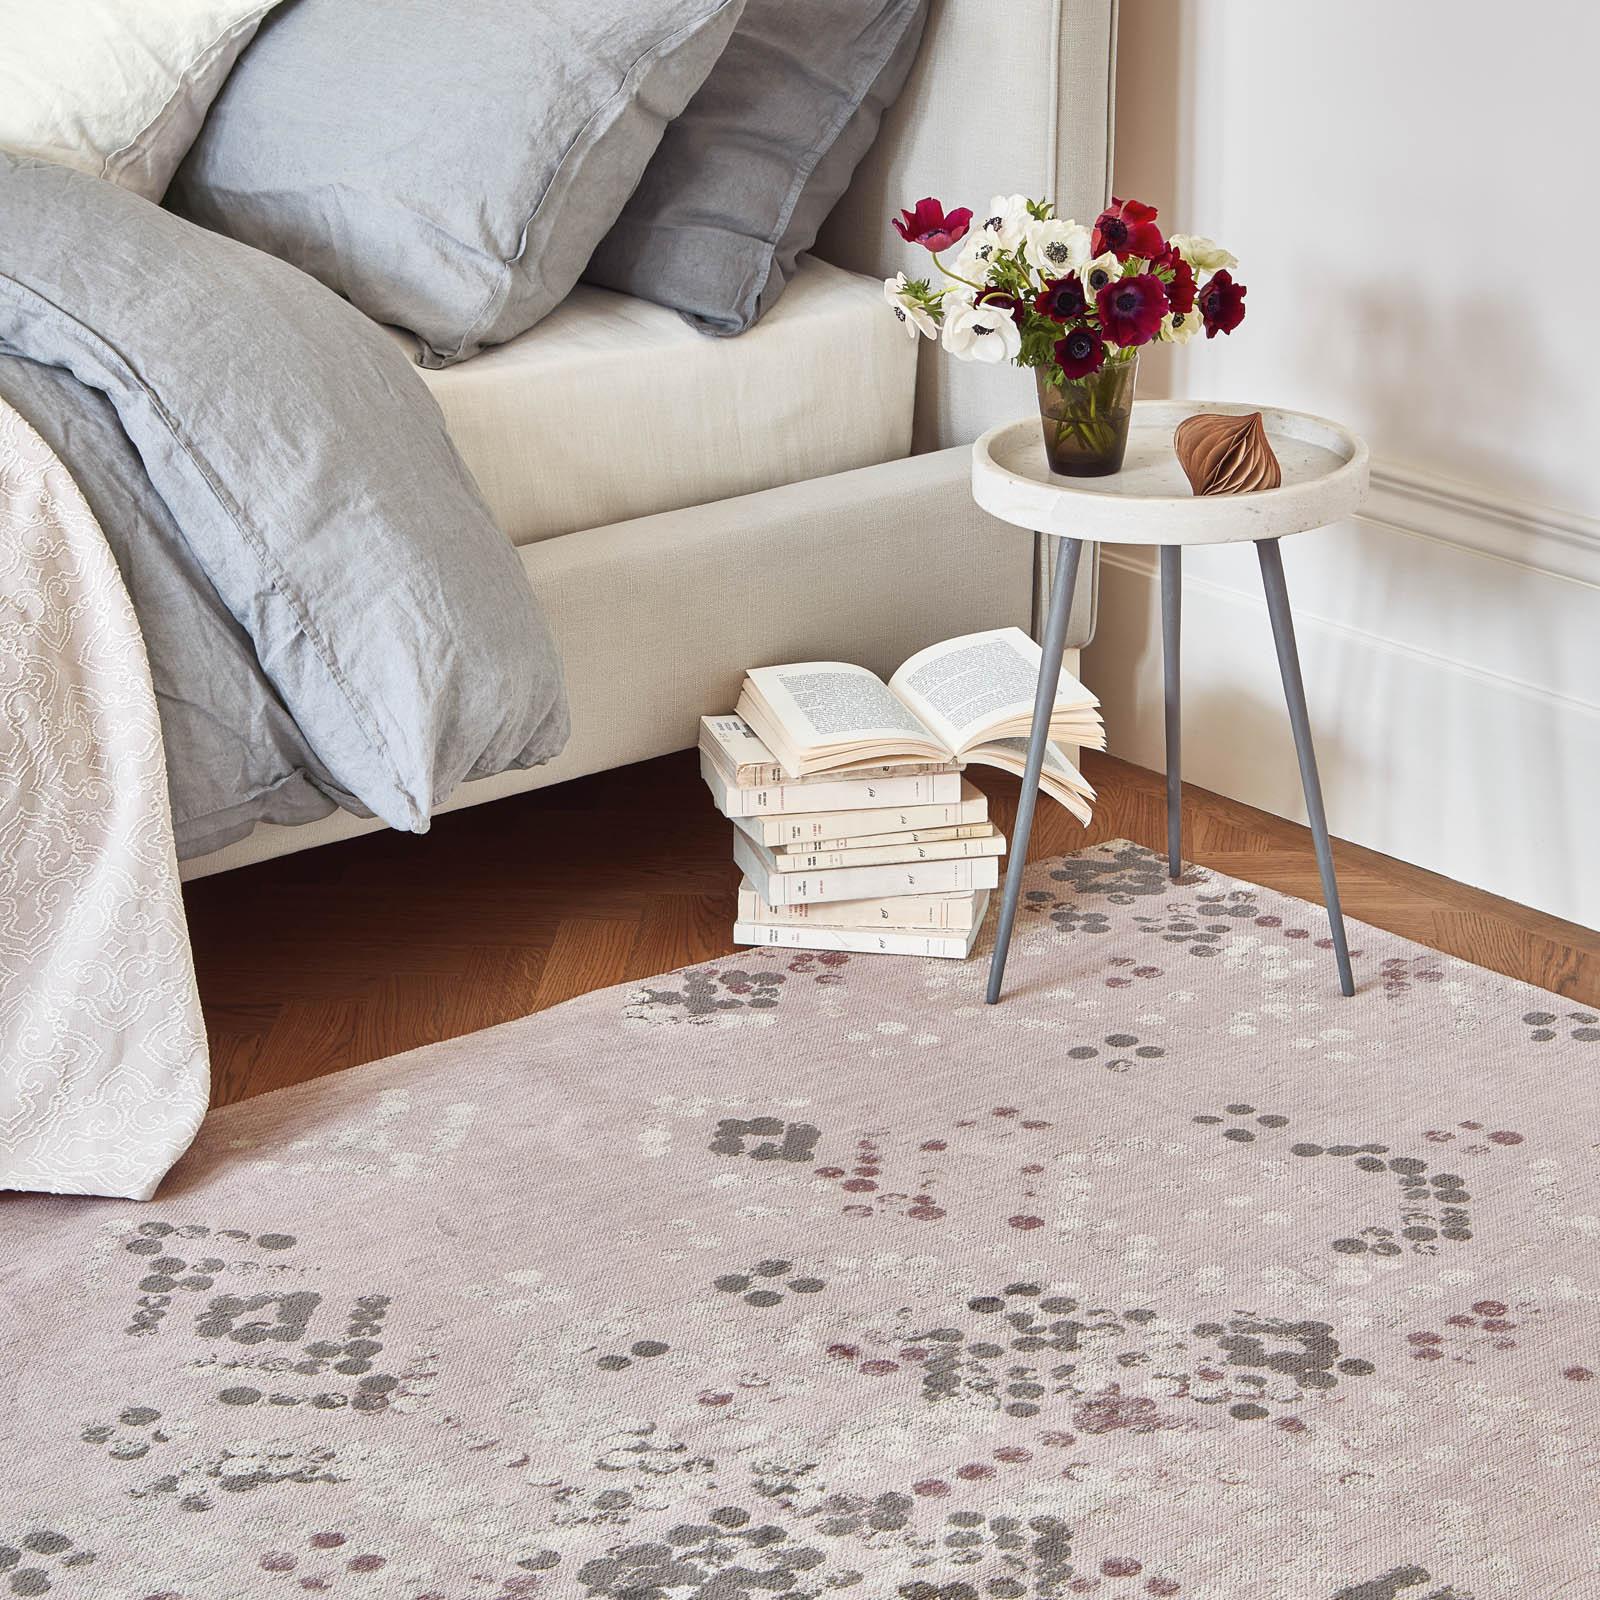 Villa Nova Marit rugs in 8760 Bramble